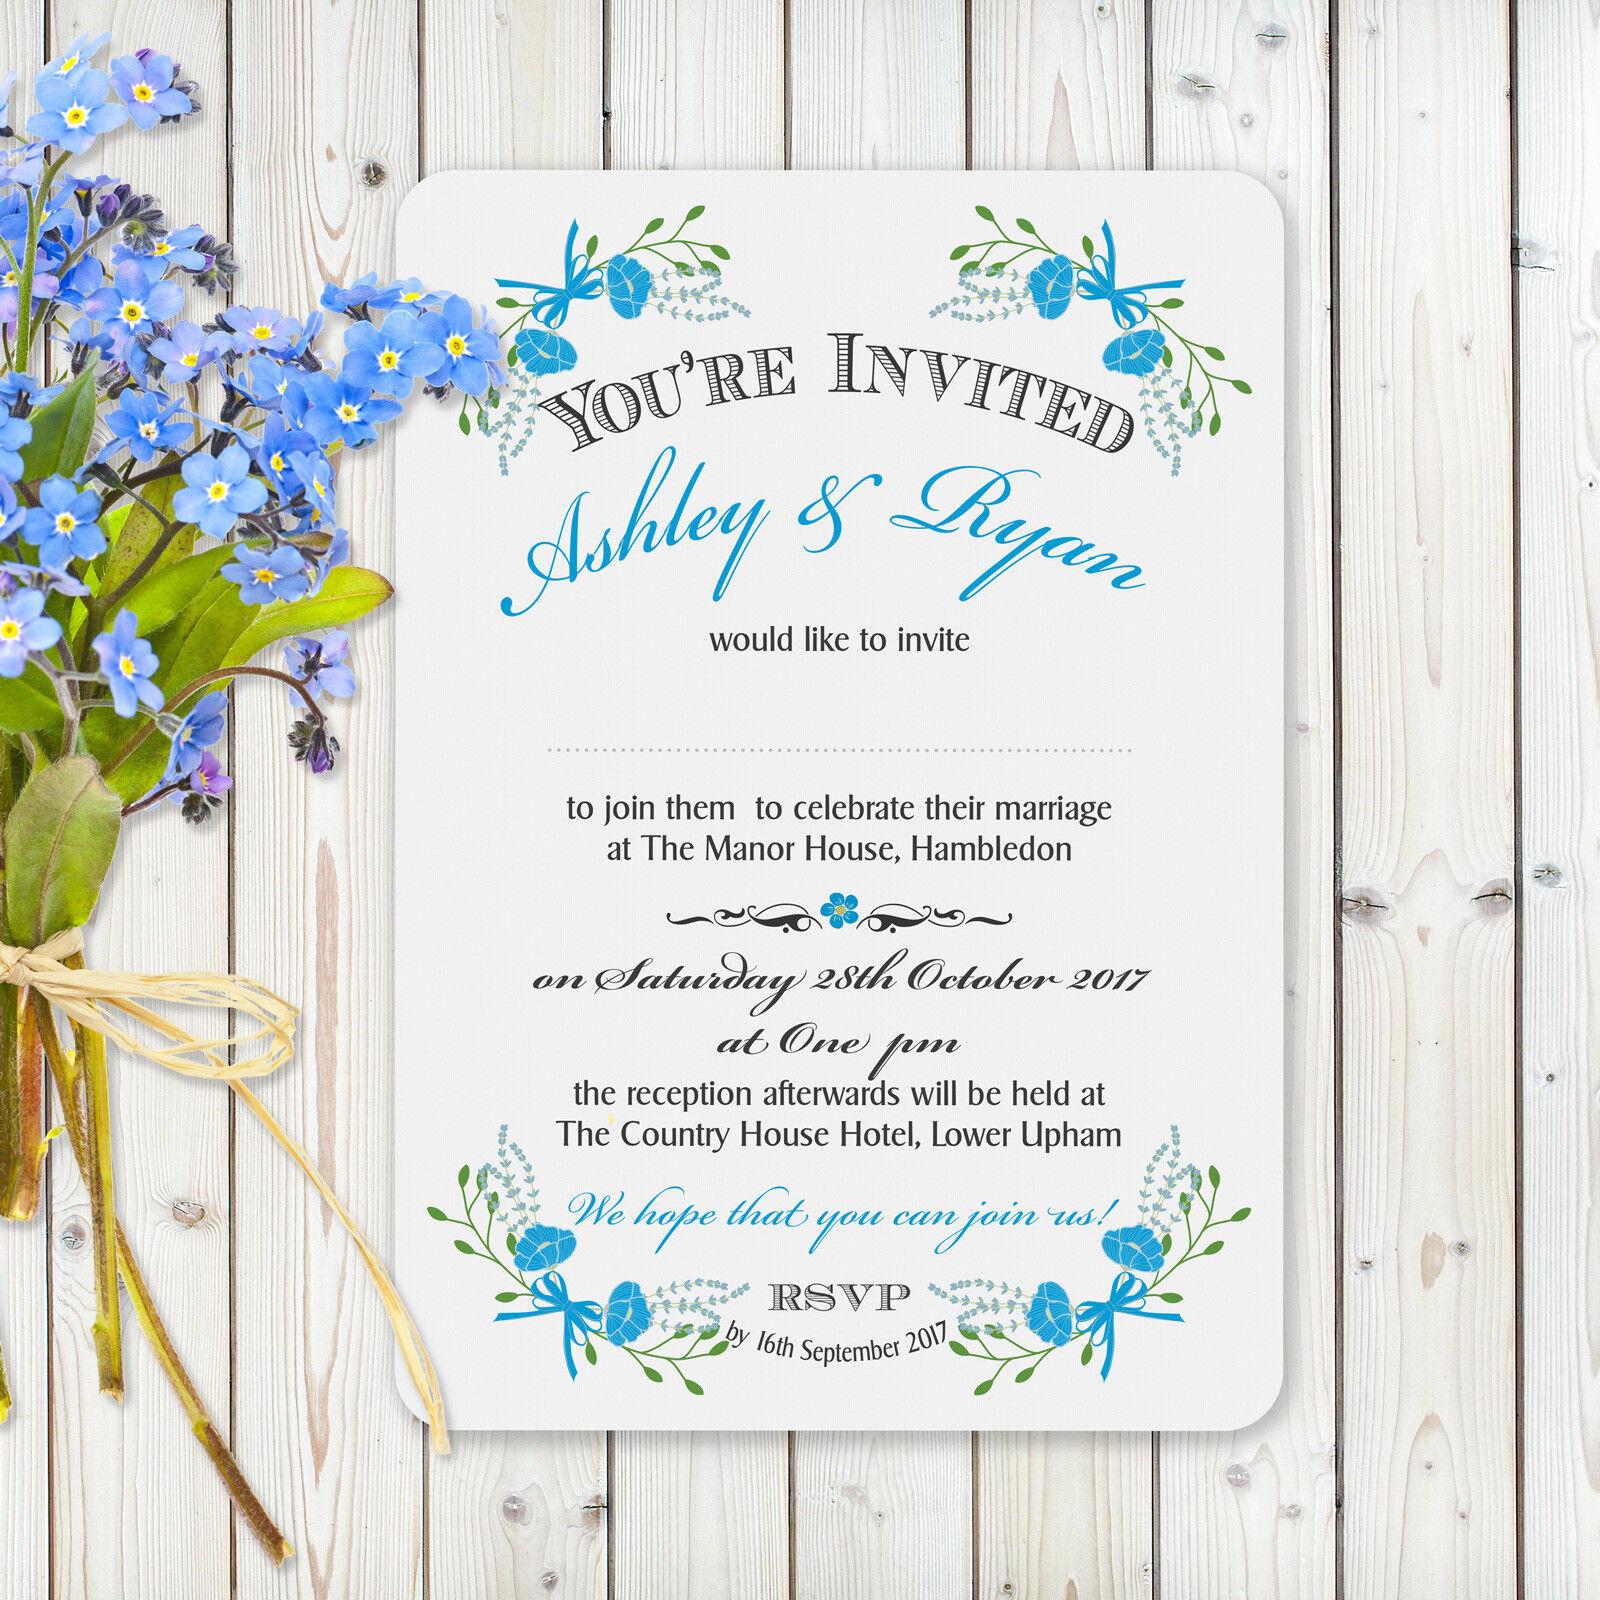 Personalised Vintage Wedding Invitations Fantasy Floral Blau inc Envelopes Weiß